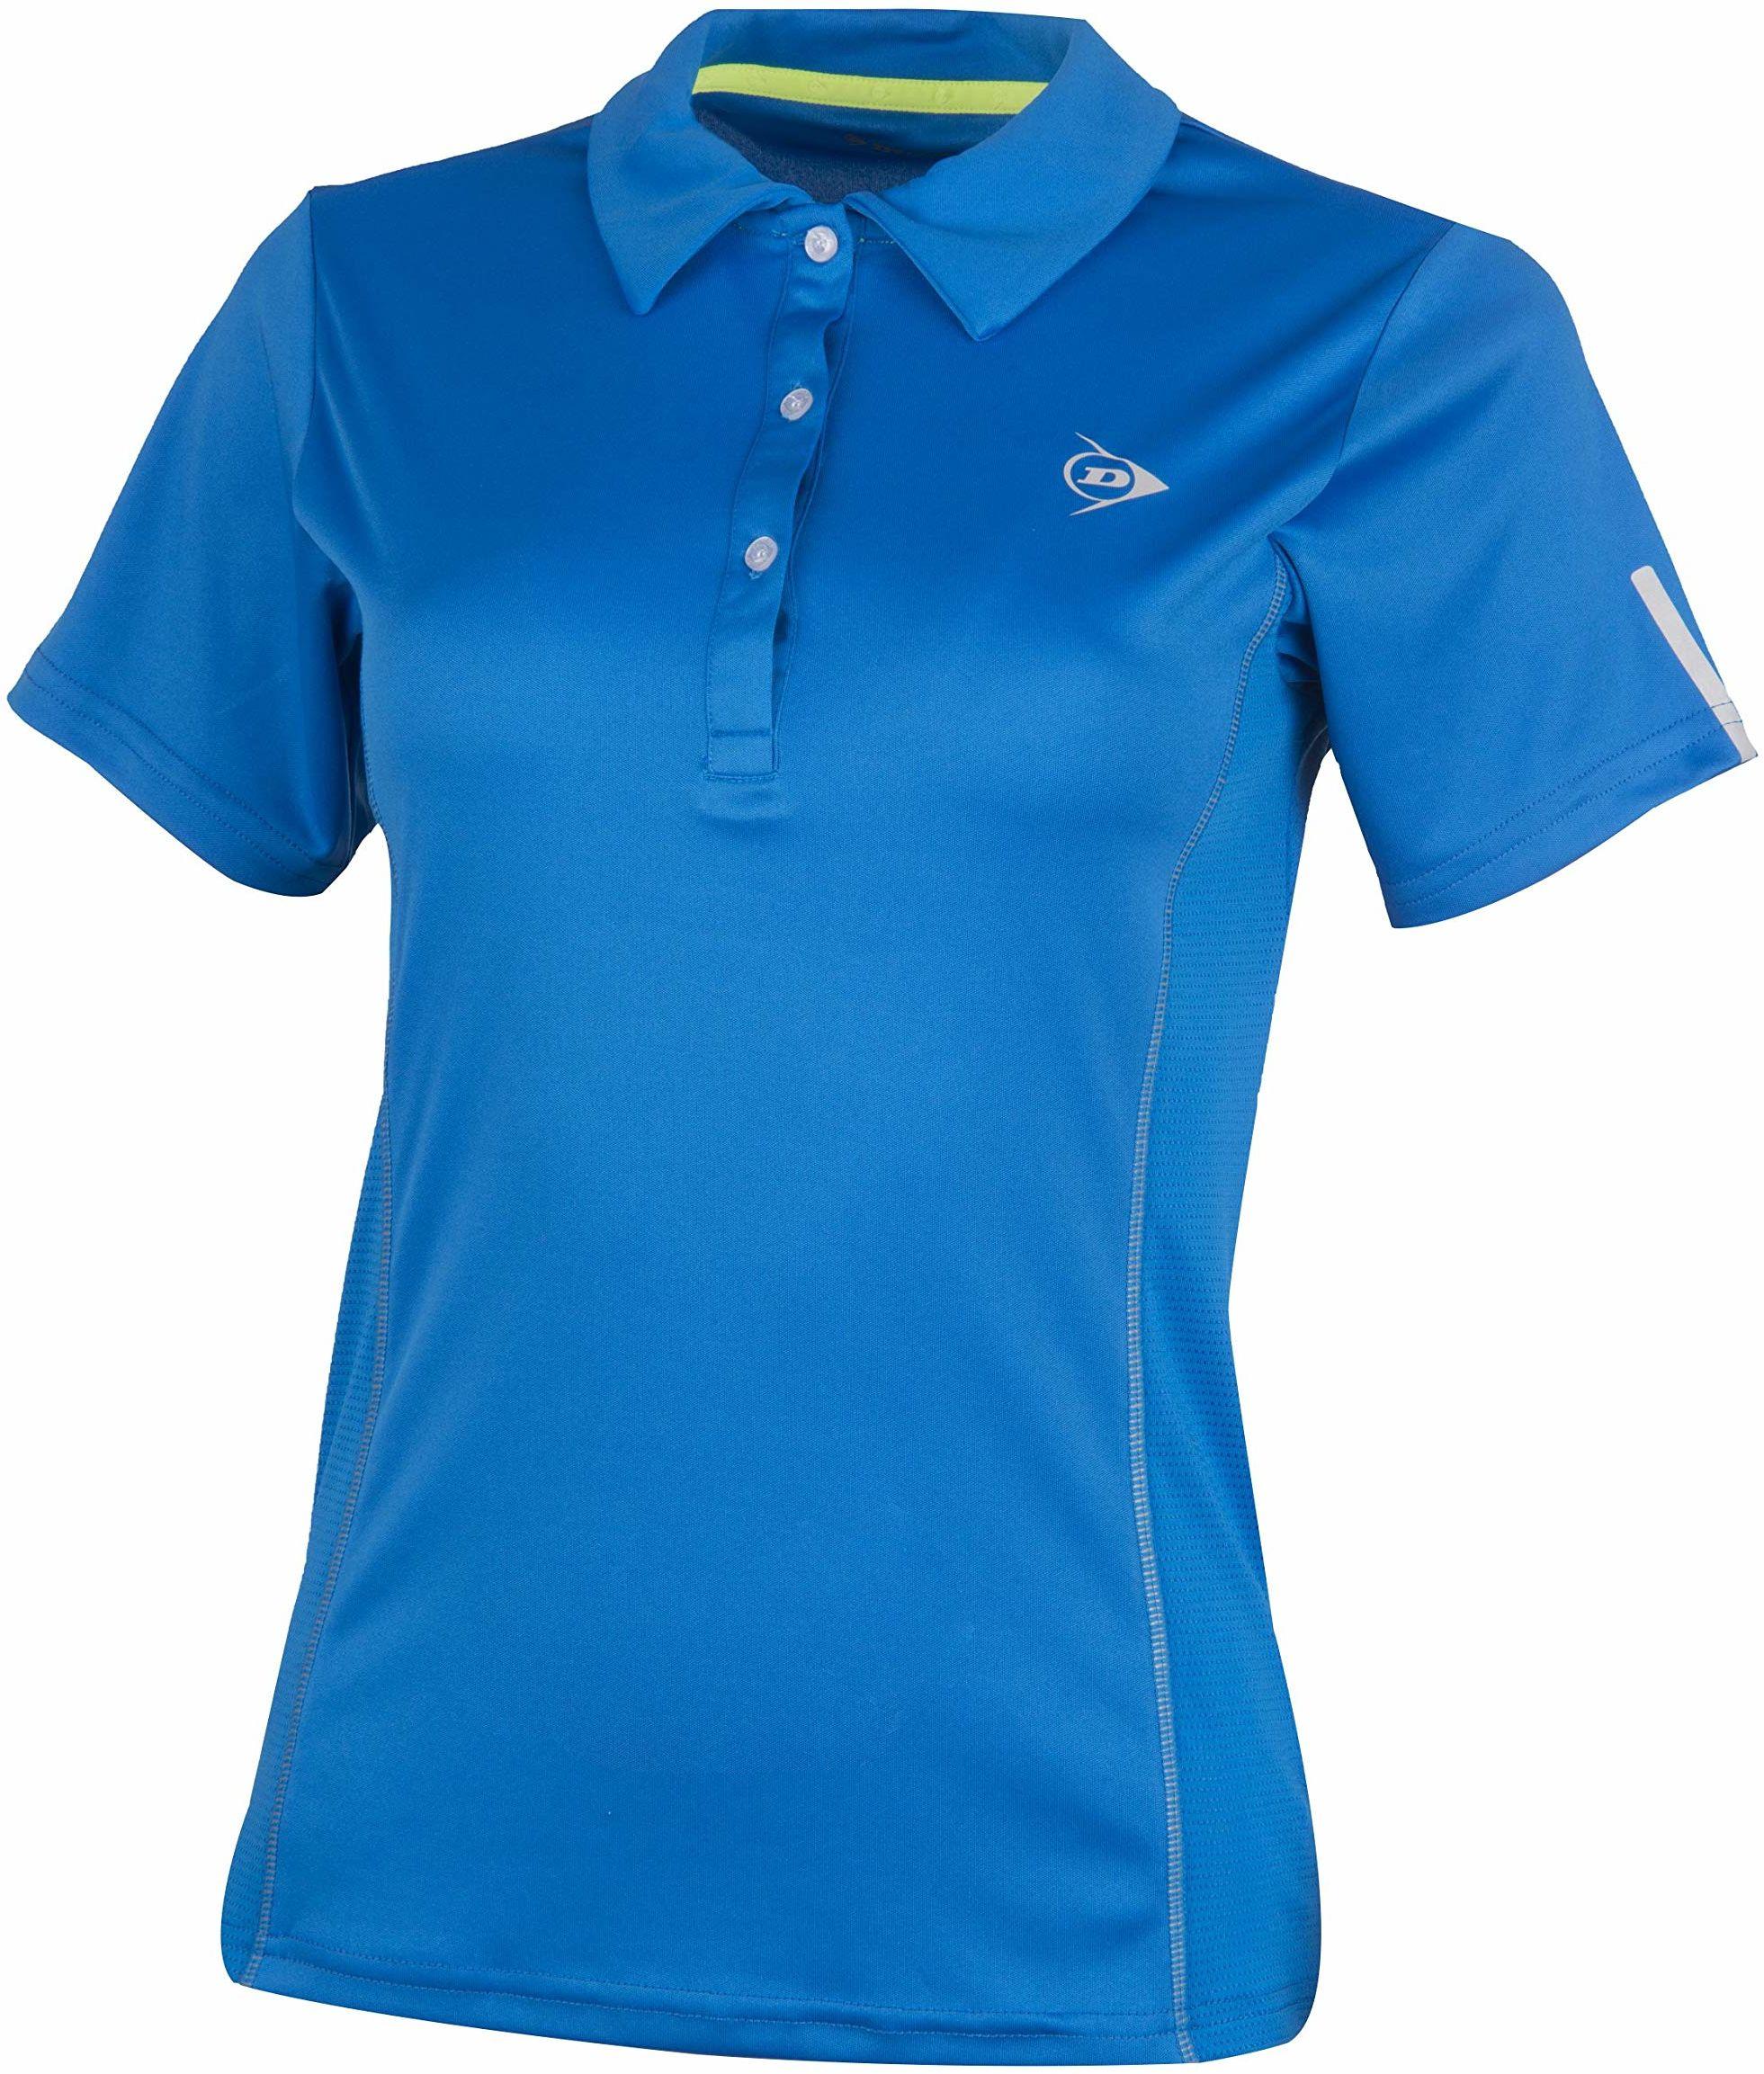 Dunlop Club Line Ladies Polo Royal Club Line damska koszulka polo niebieski niebieski M